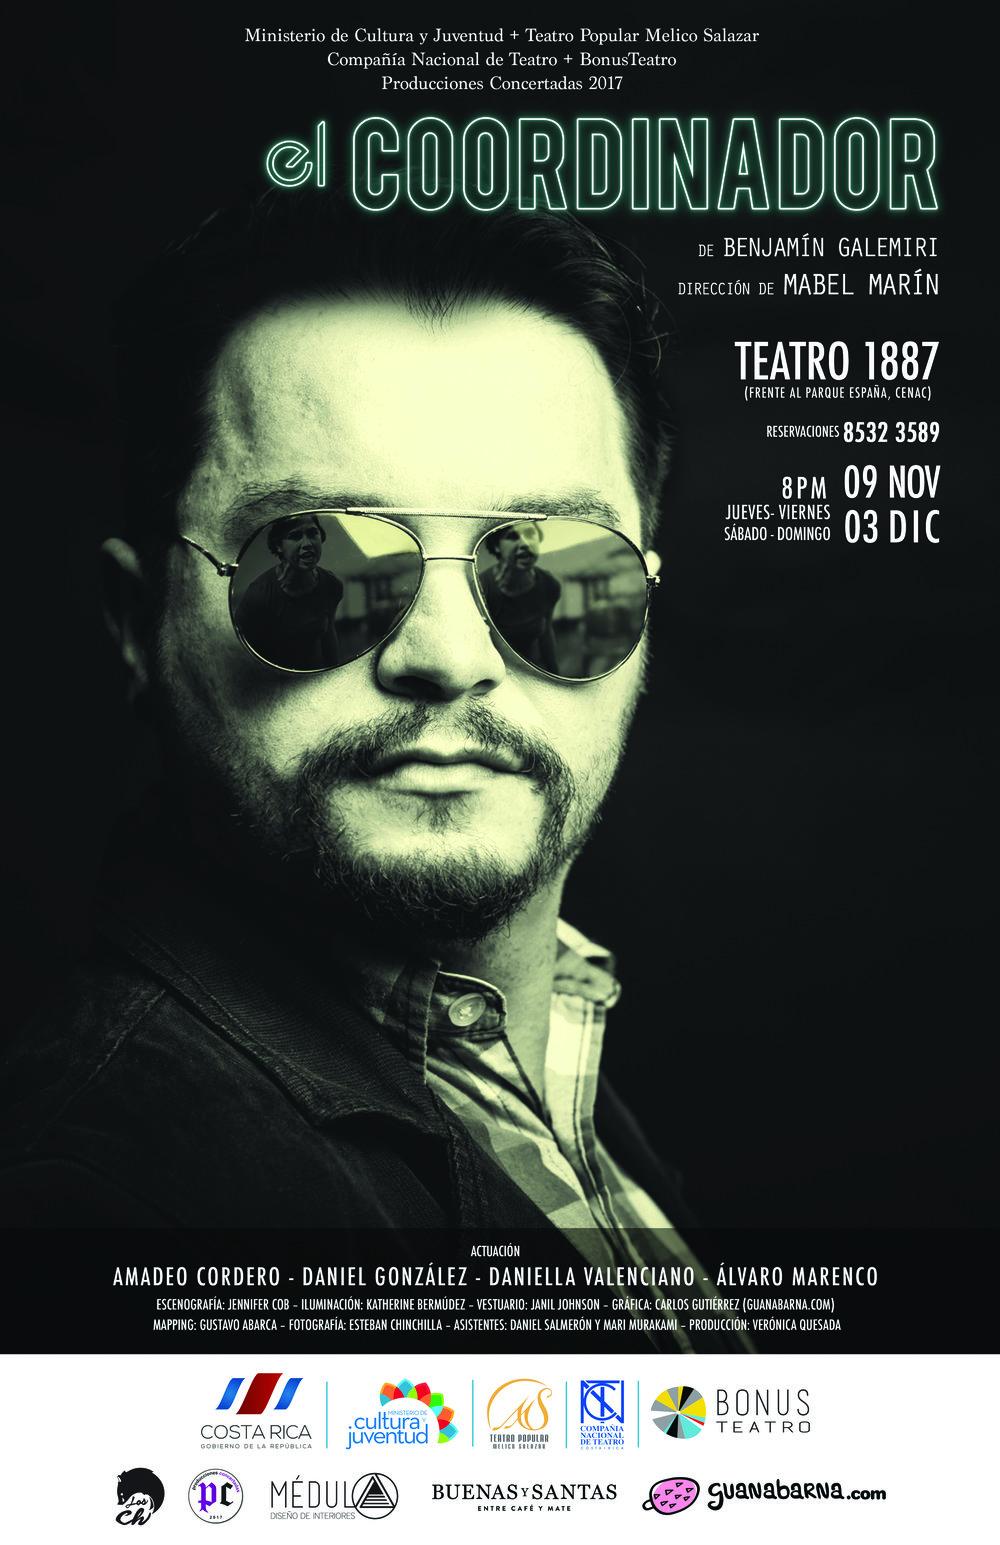 Afiche_El Coordinador_final_11x17 (1).jpg